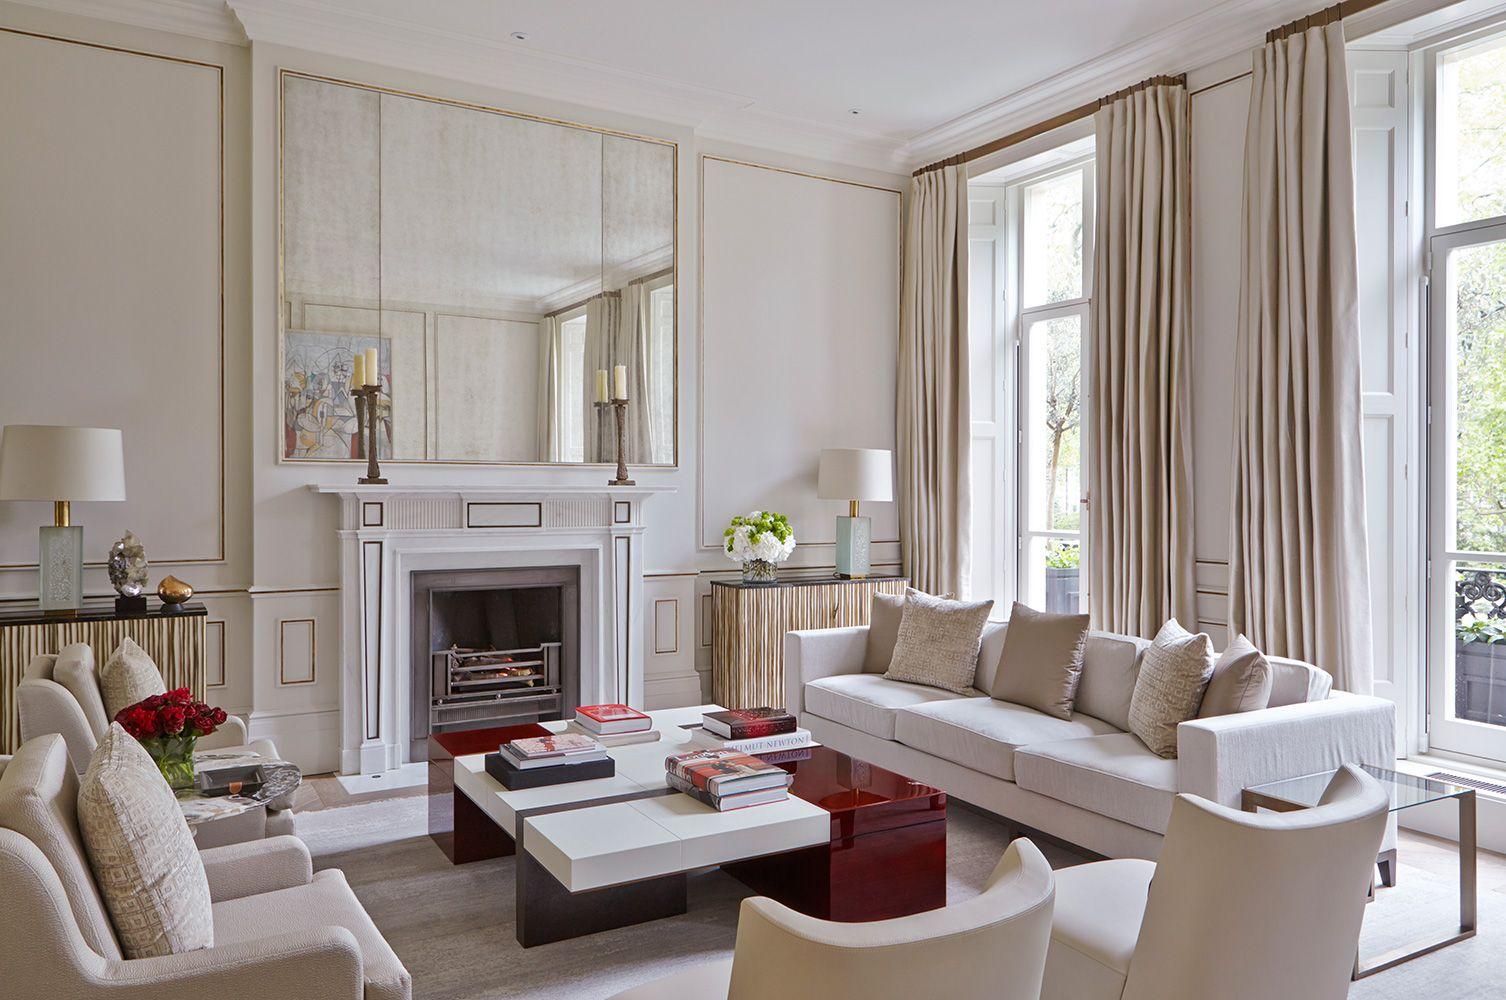 INTERIOR DESIGN LONDON HOUSES BELGRAVIA